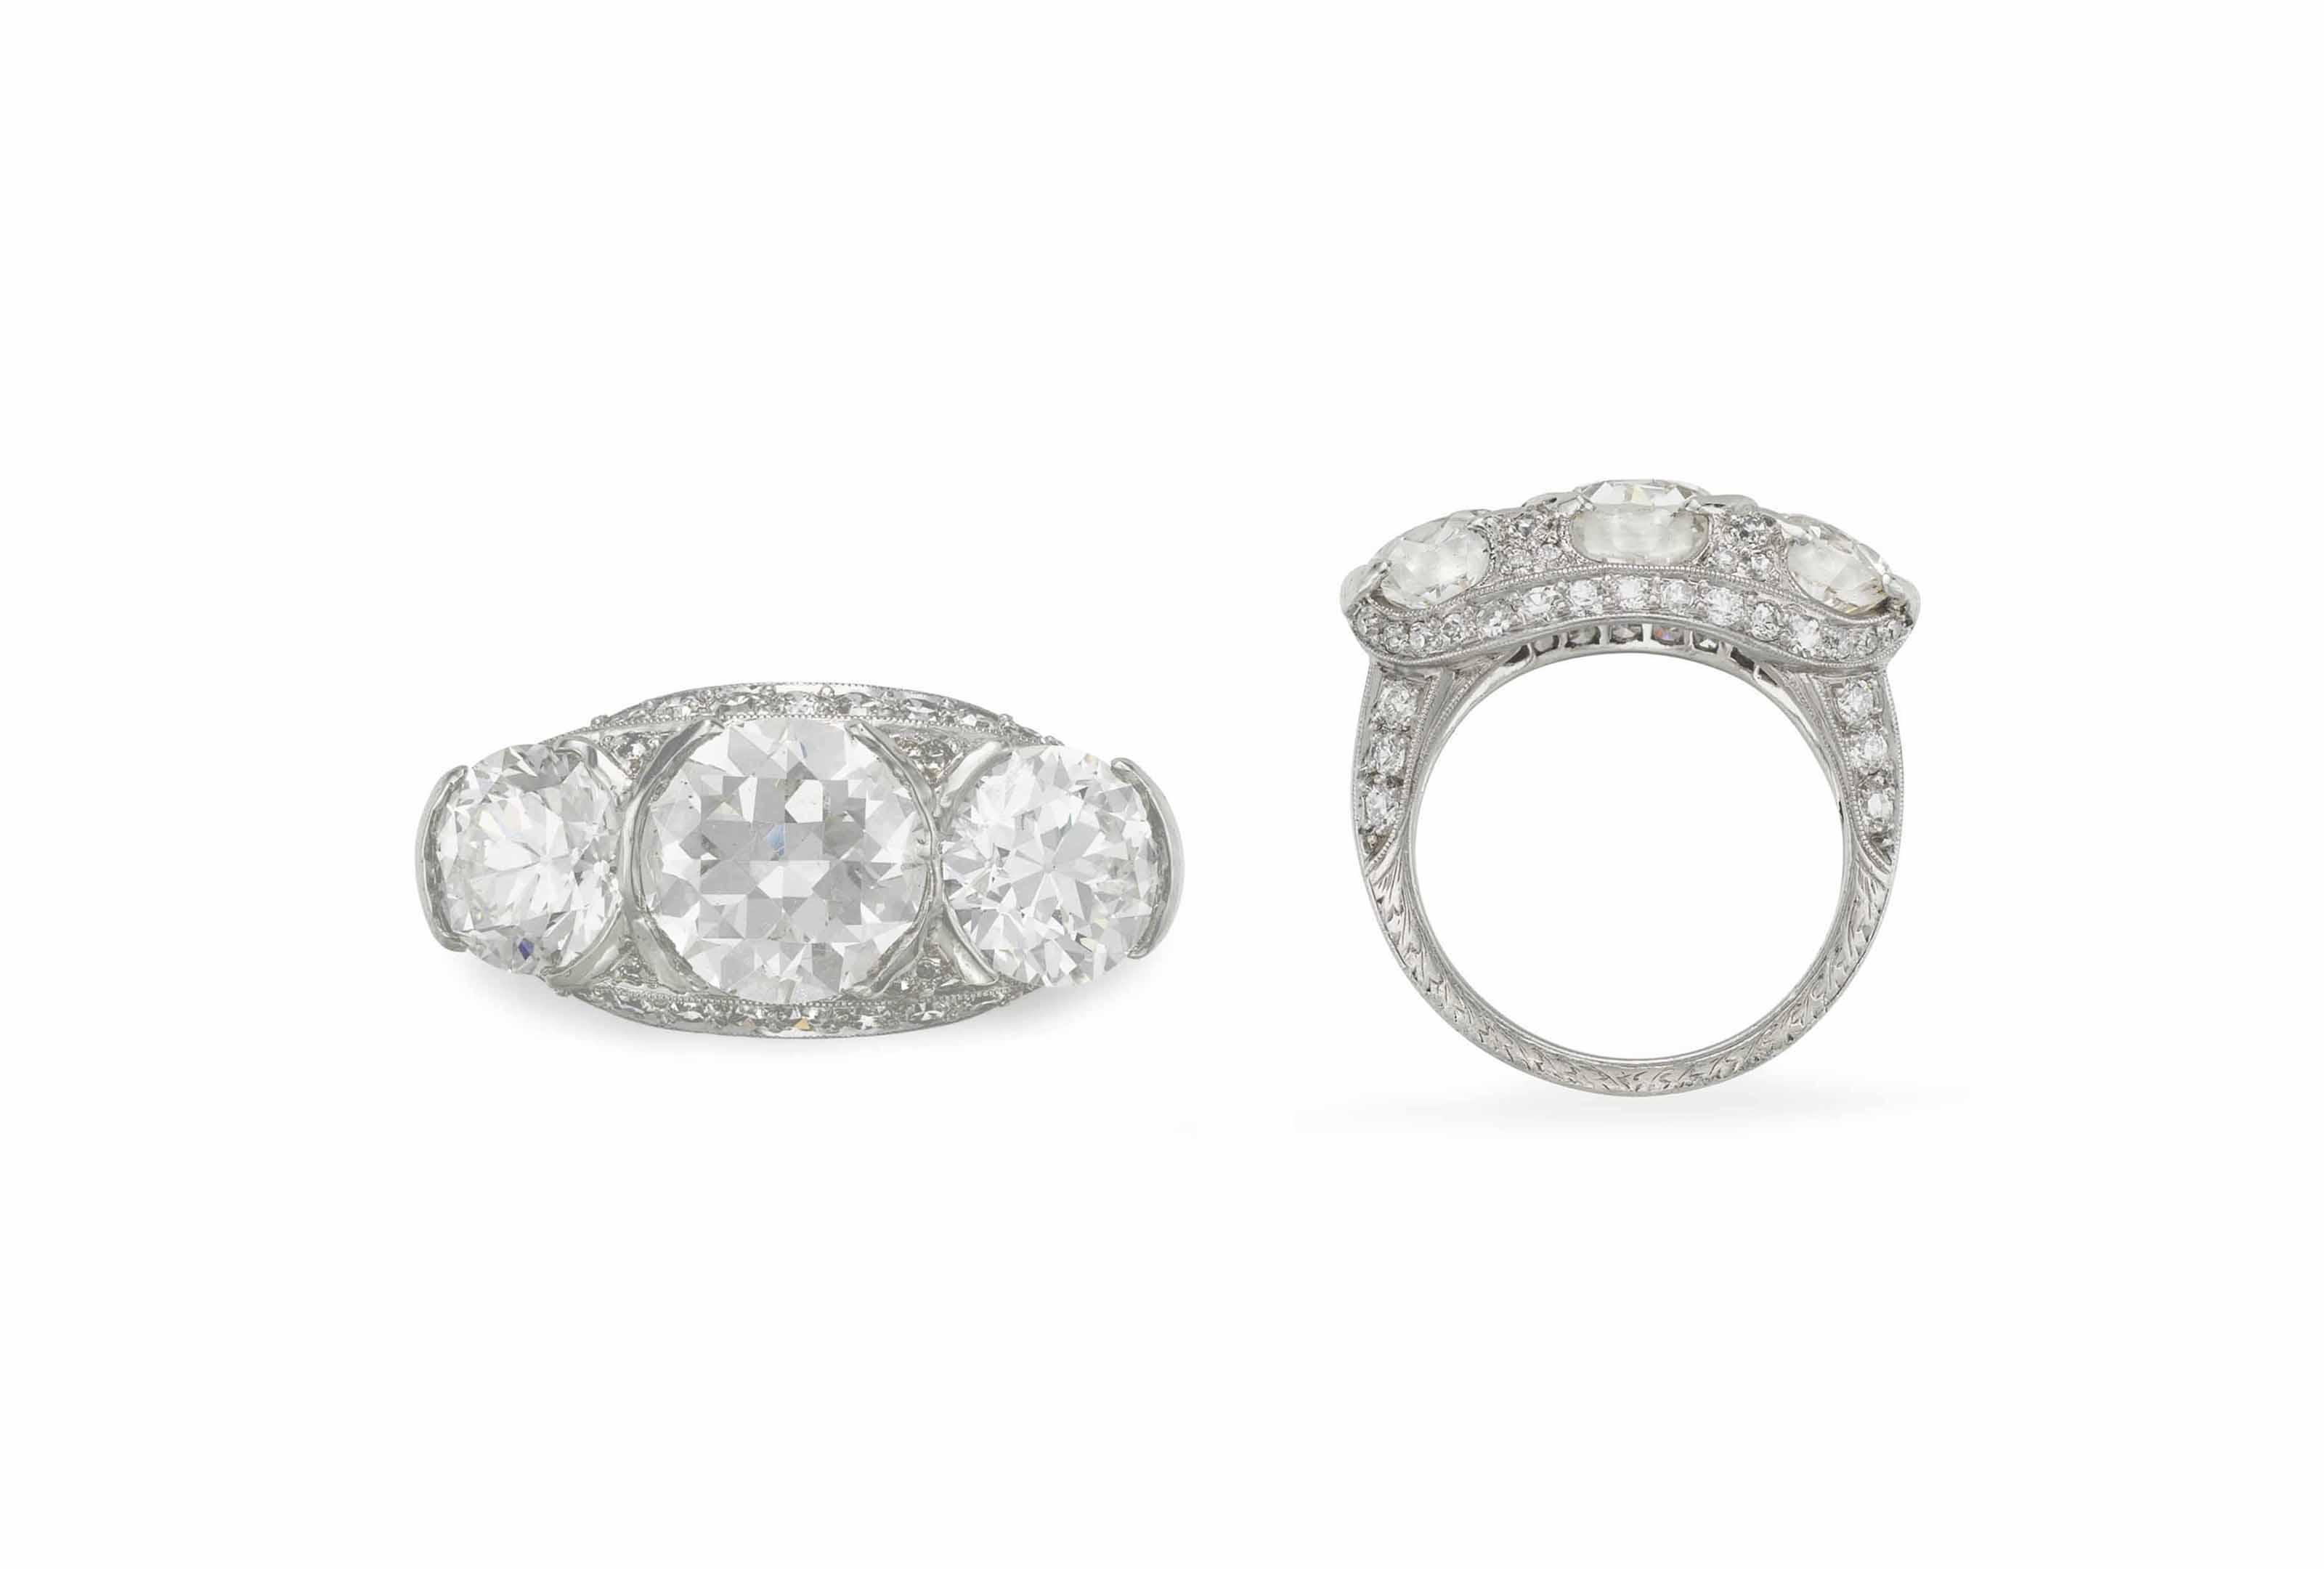 AN ART DECO THREE-STONE DIAMOND RING, BY J. E. CALDWELL & CO.